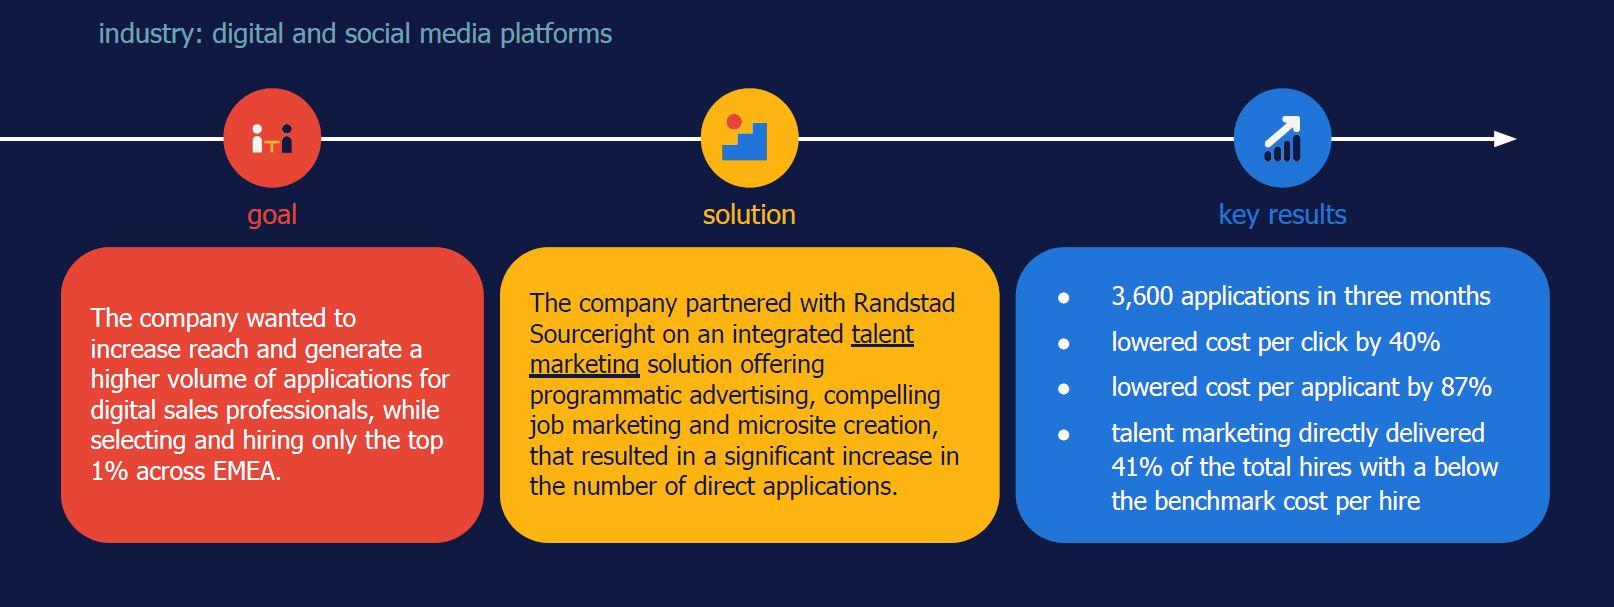 talent marketing case study - increasing applications - Randstad Sourceright